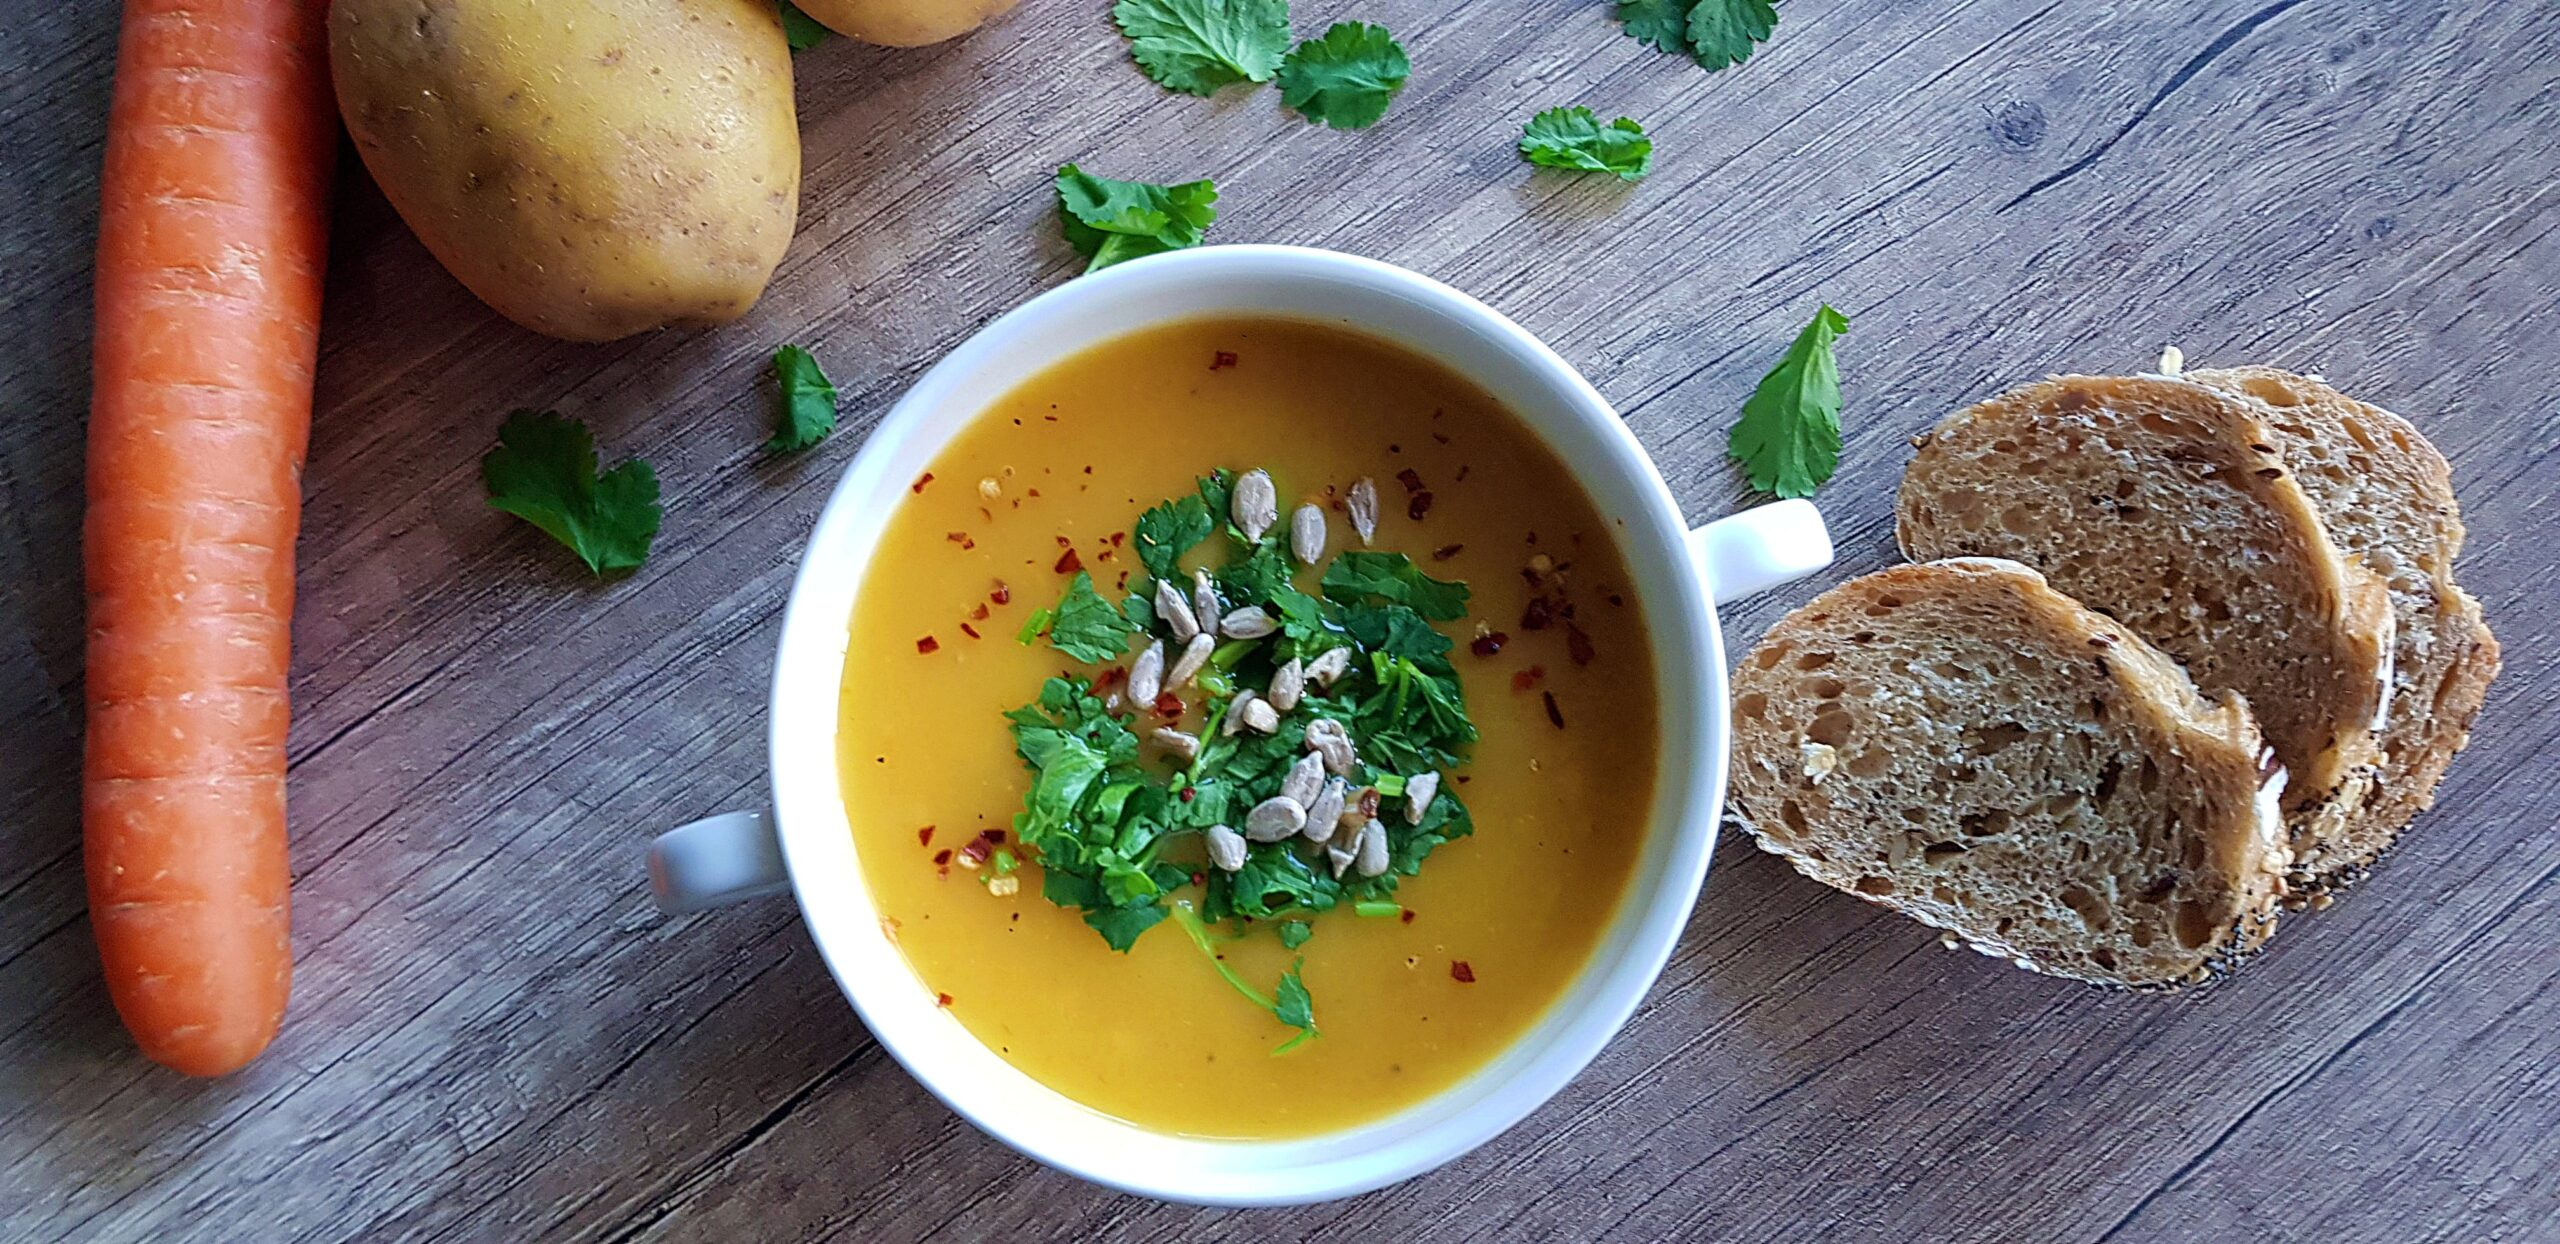 Aardappel wortel soep | strongbody.nl